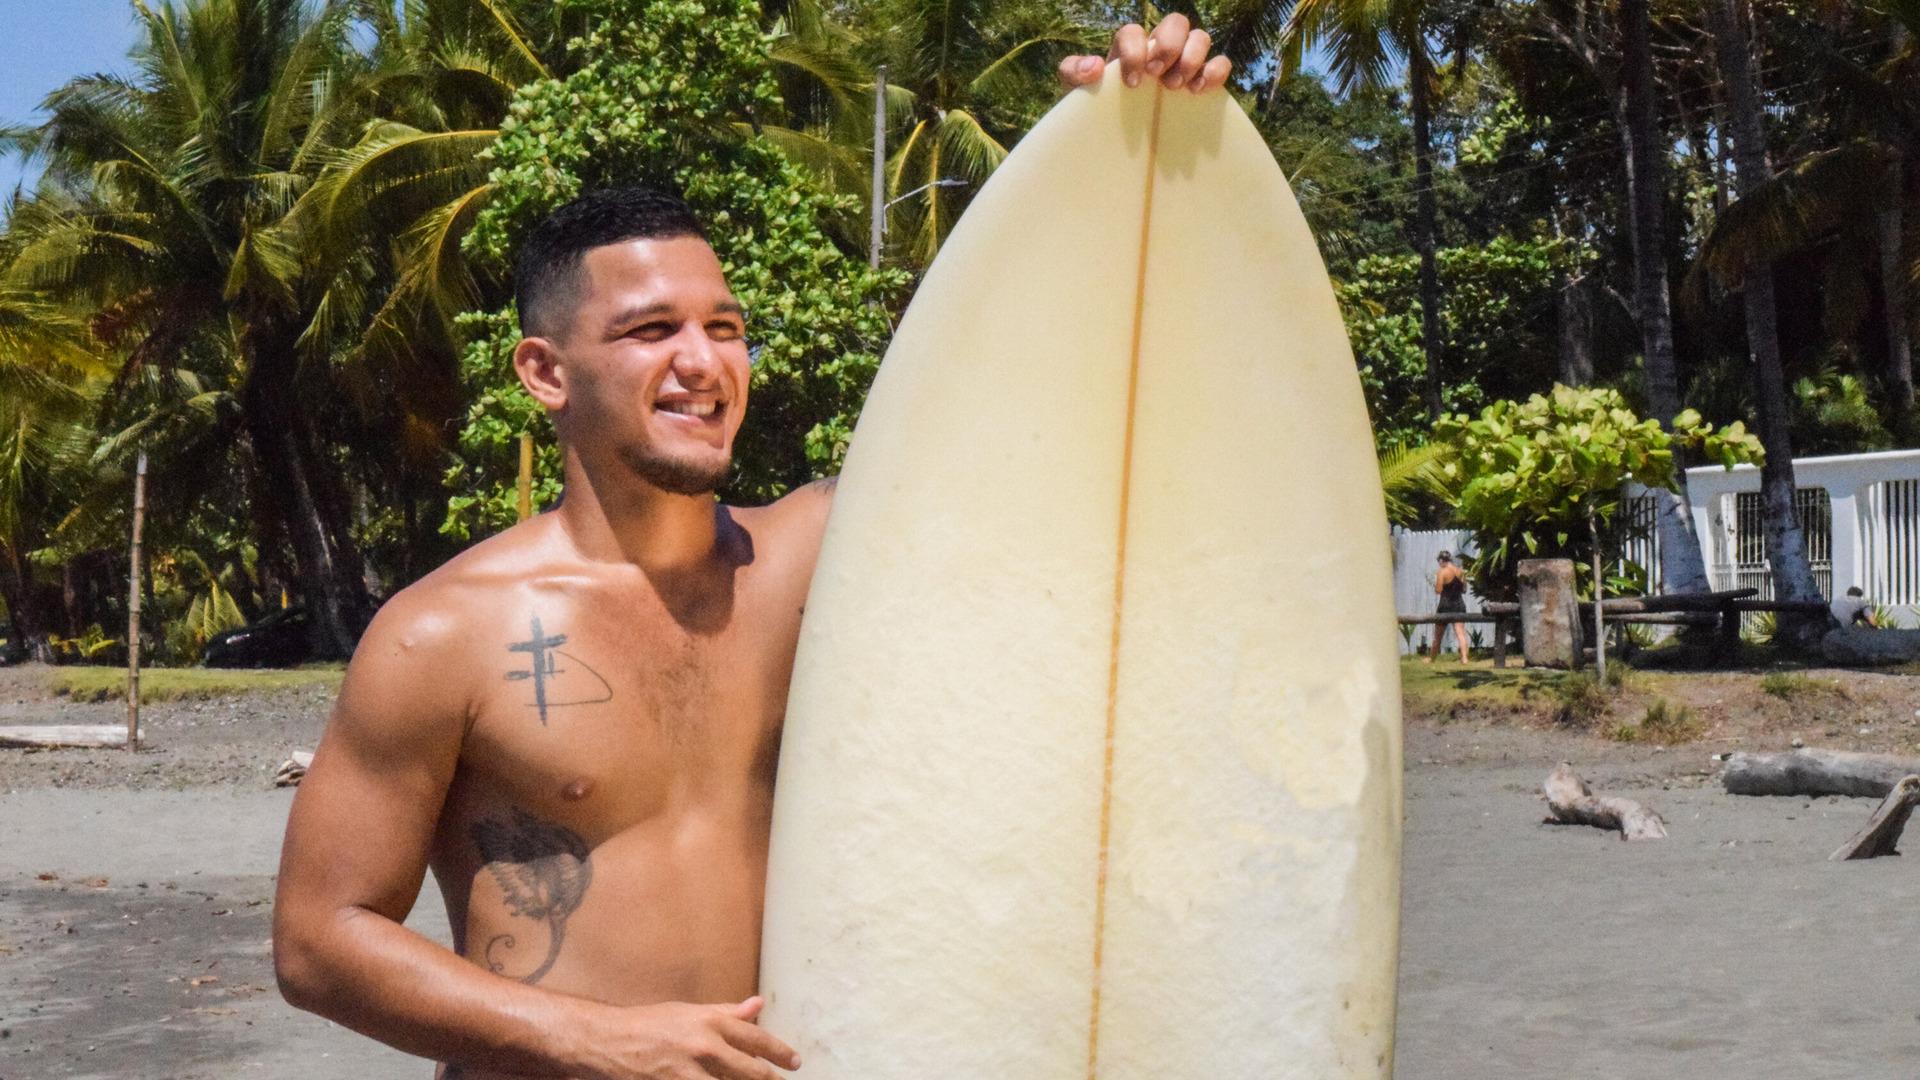 Love in Paradise: The Caribbean — s01e01 — Tropic Like It's Hot